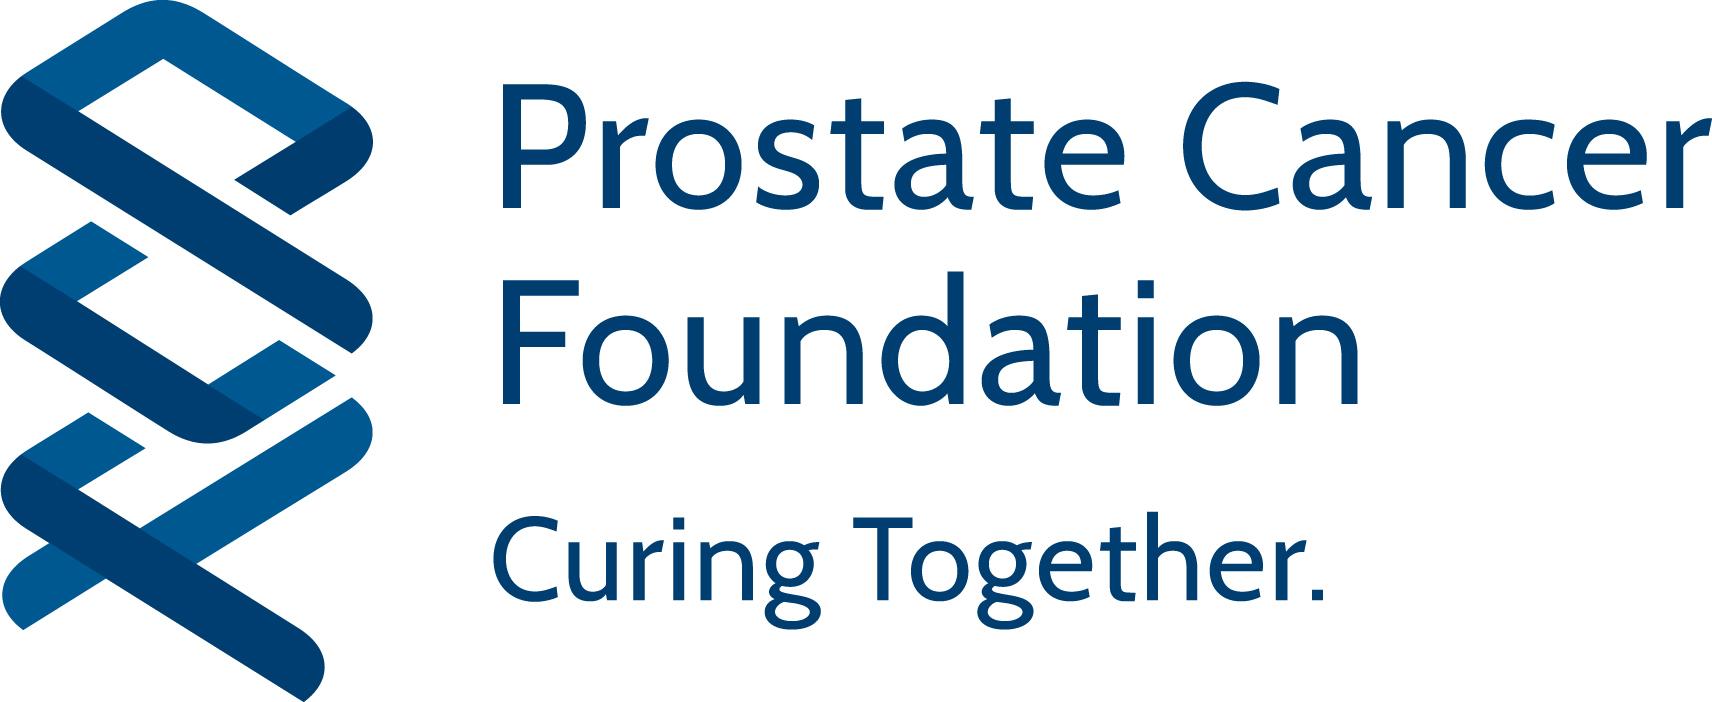 prostate cancer foundation and major league baseball